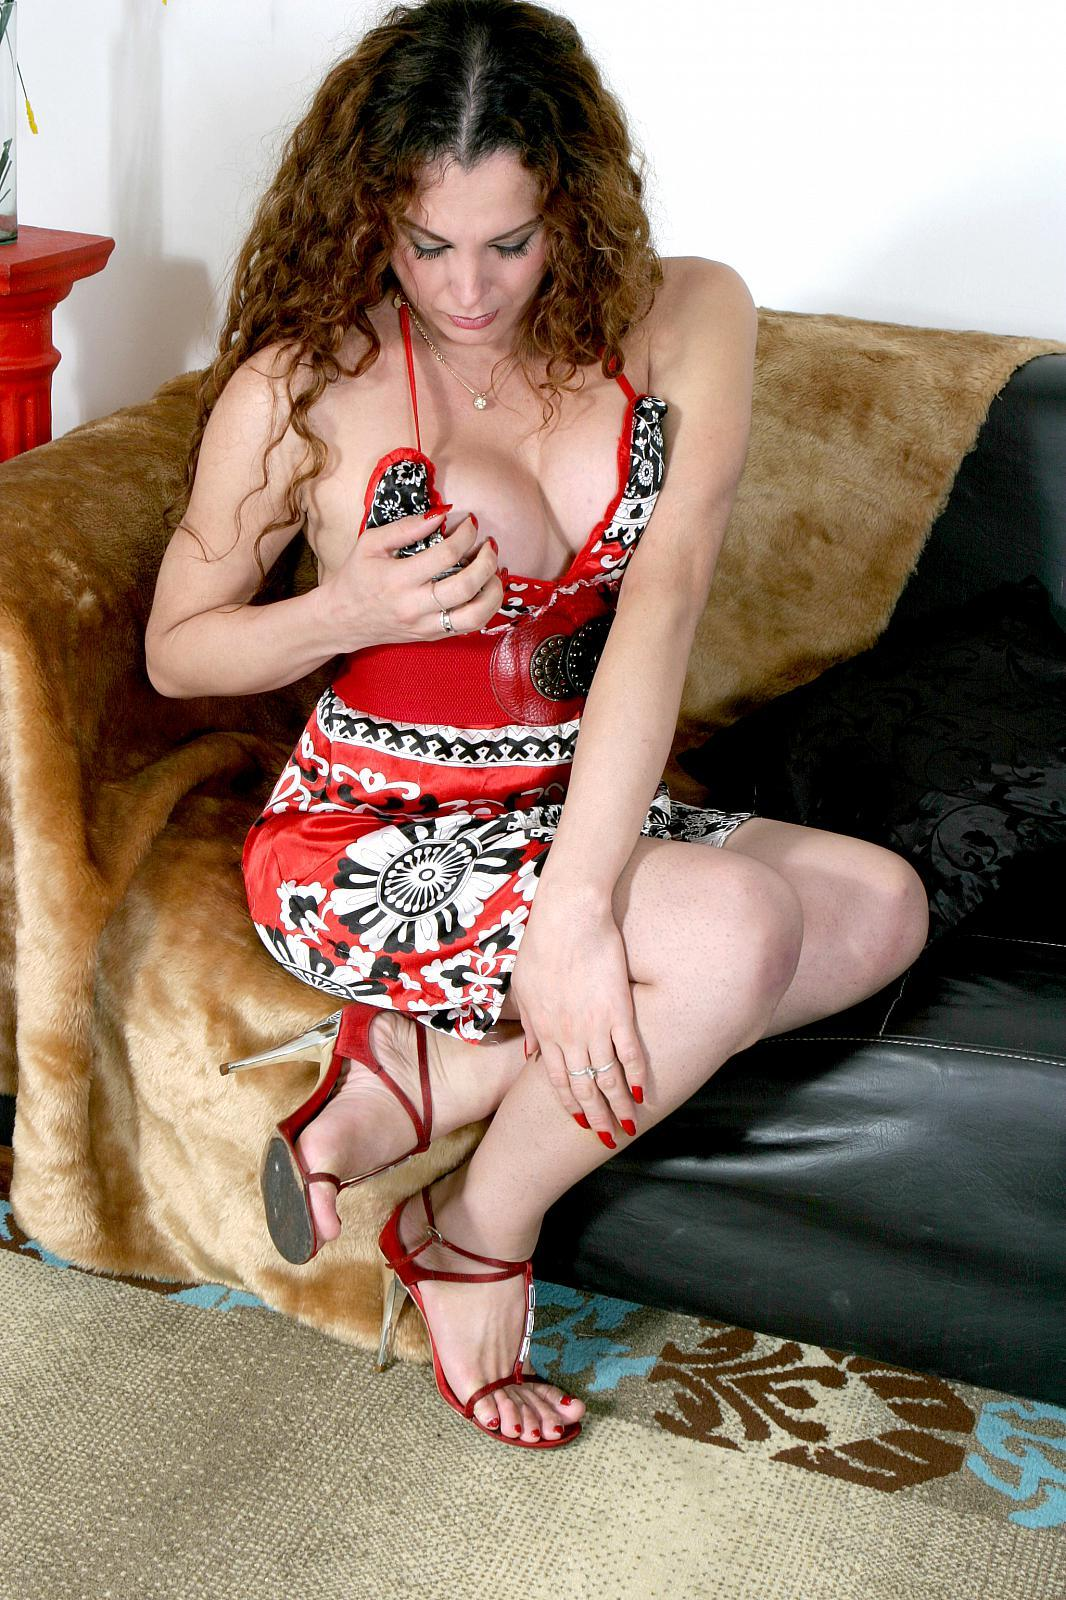 Latina Femboy Camila Spreads Her Legs To Stroke Her Cock.